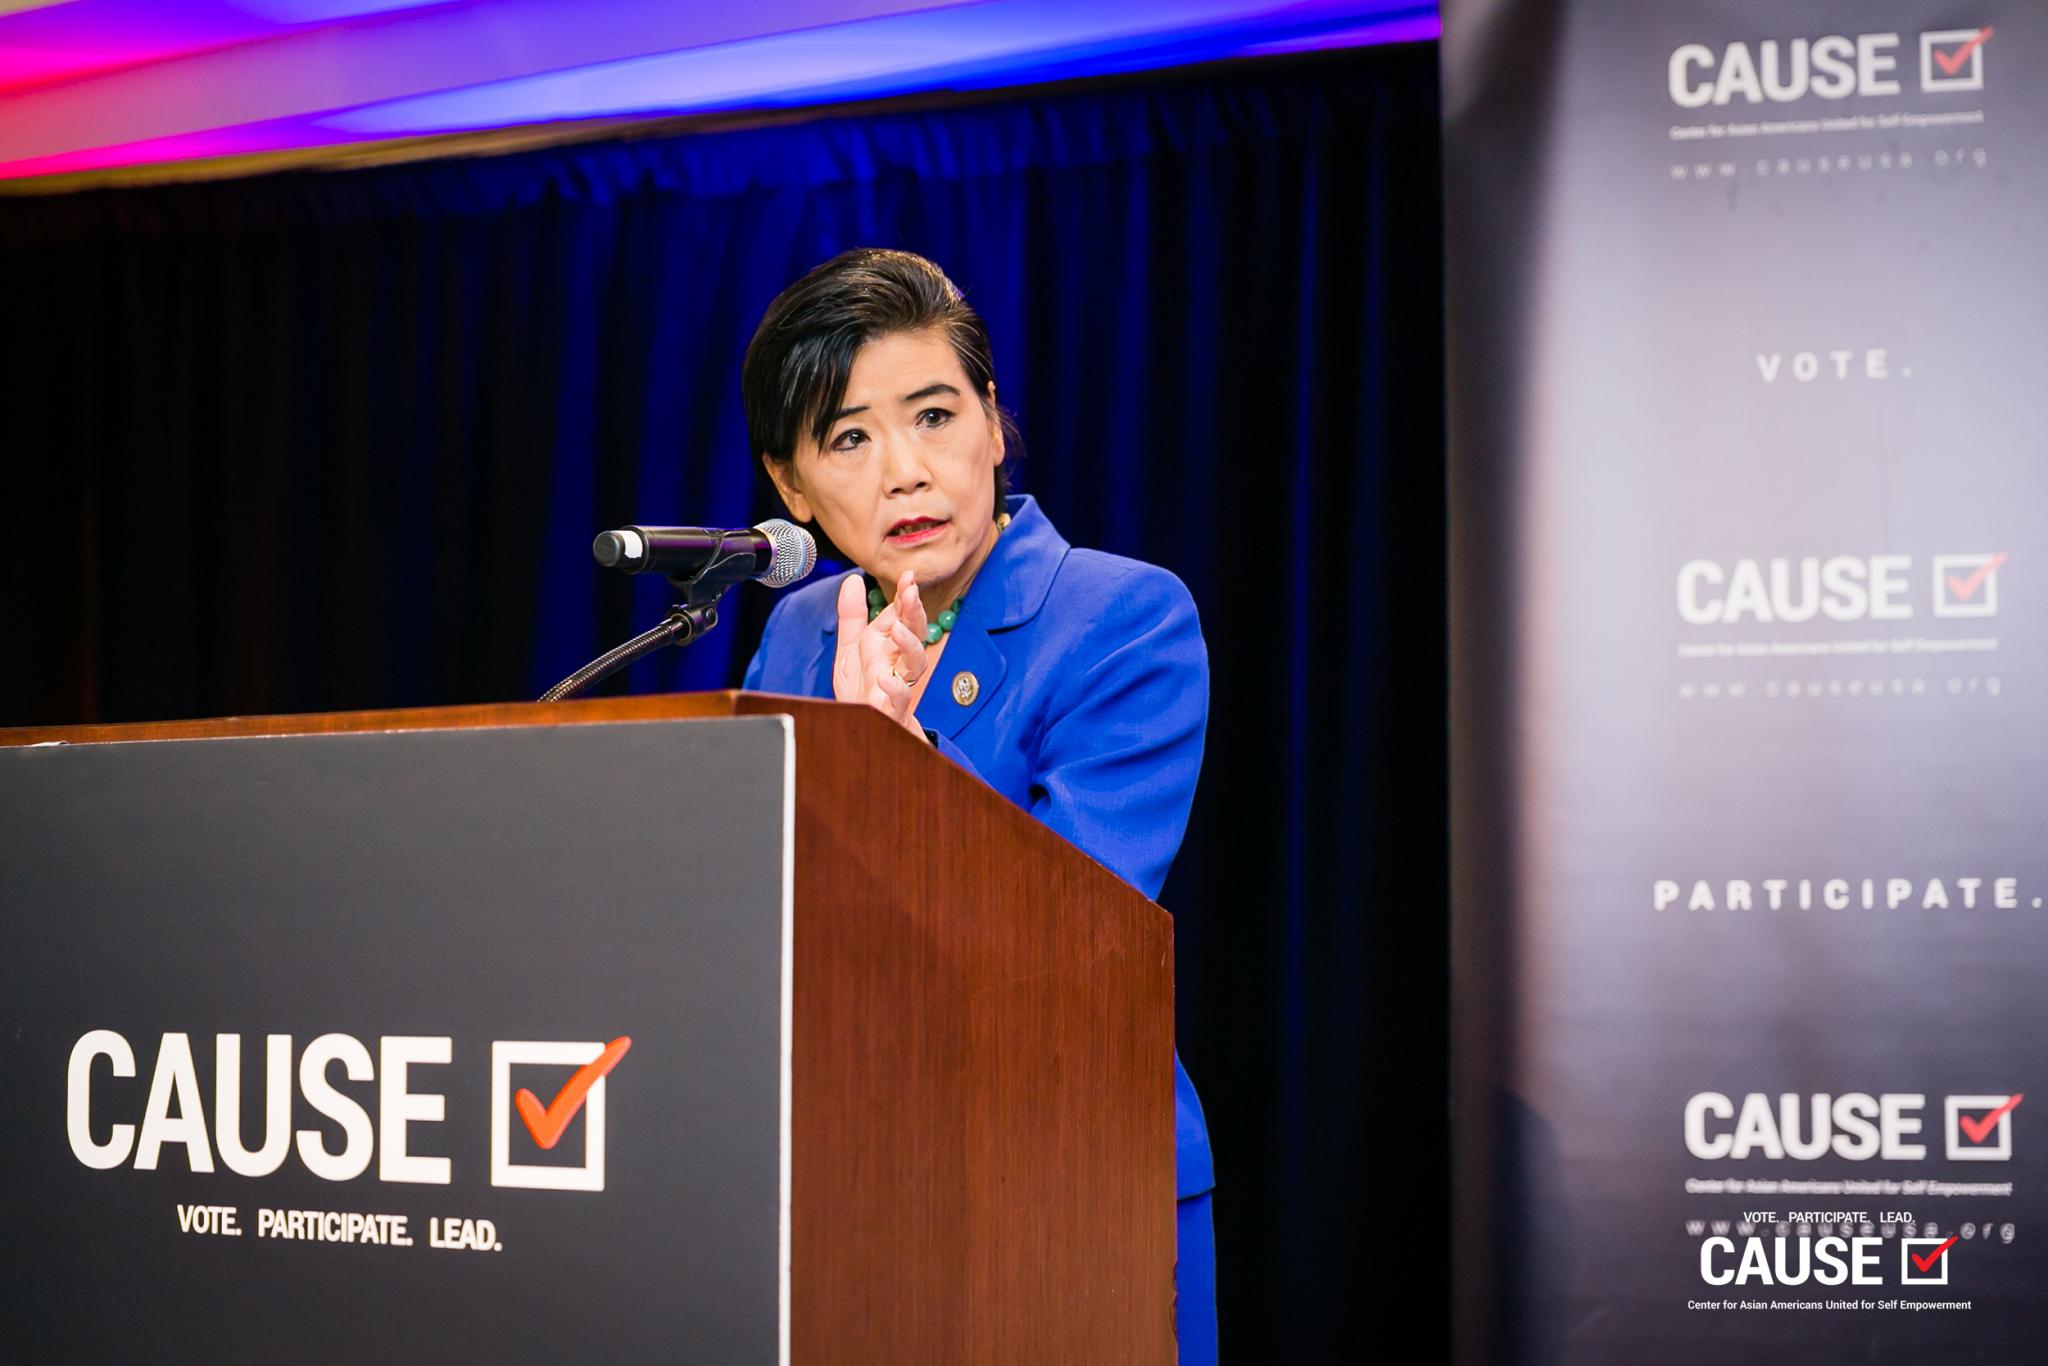 Congressmember Judy Chu